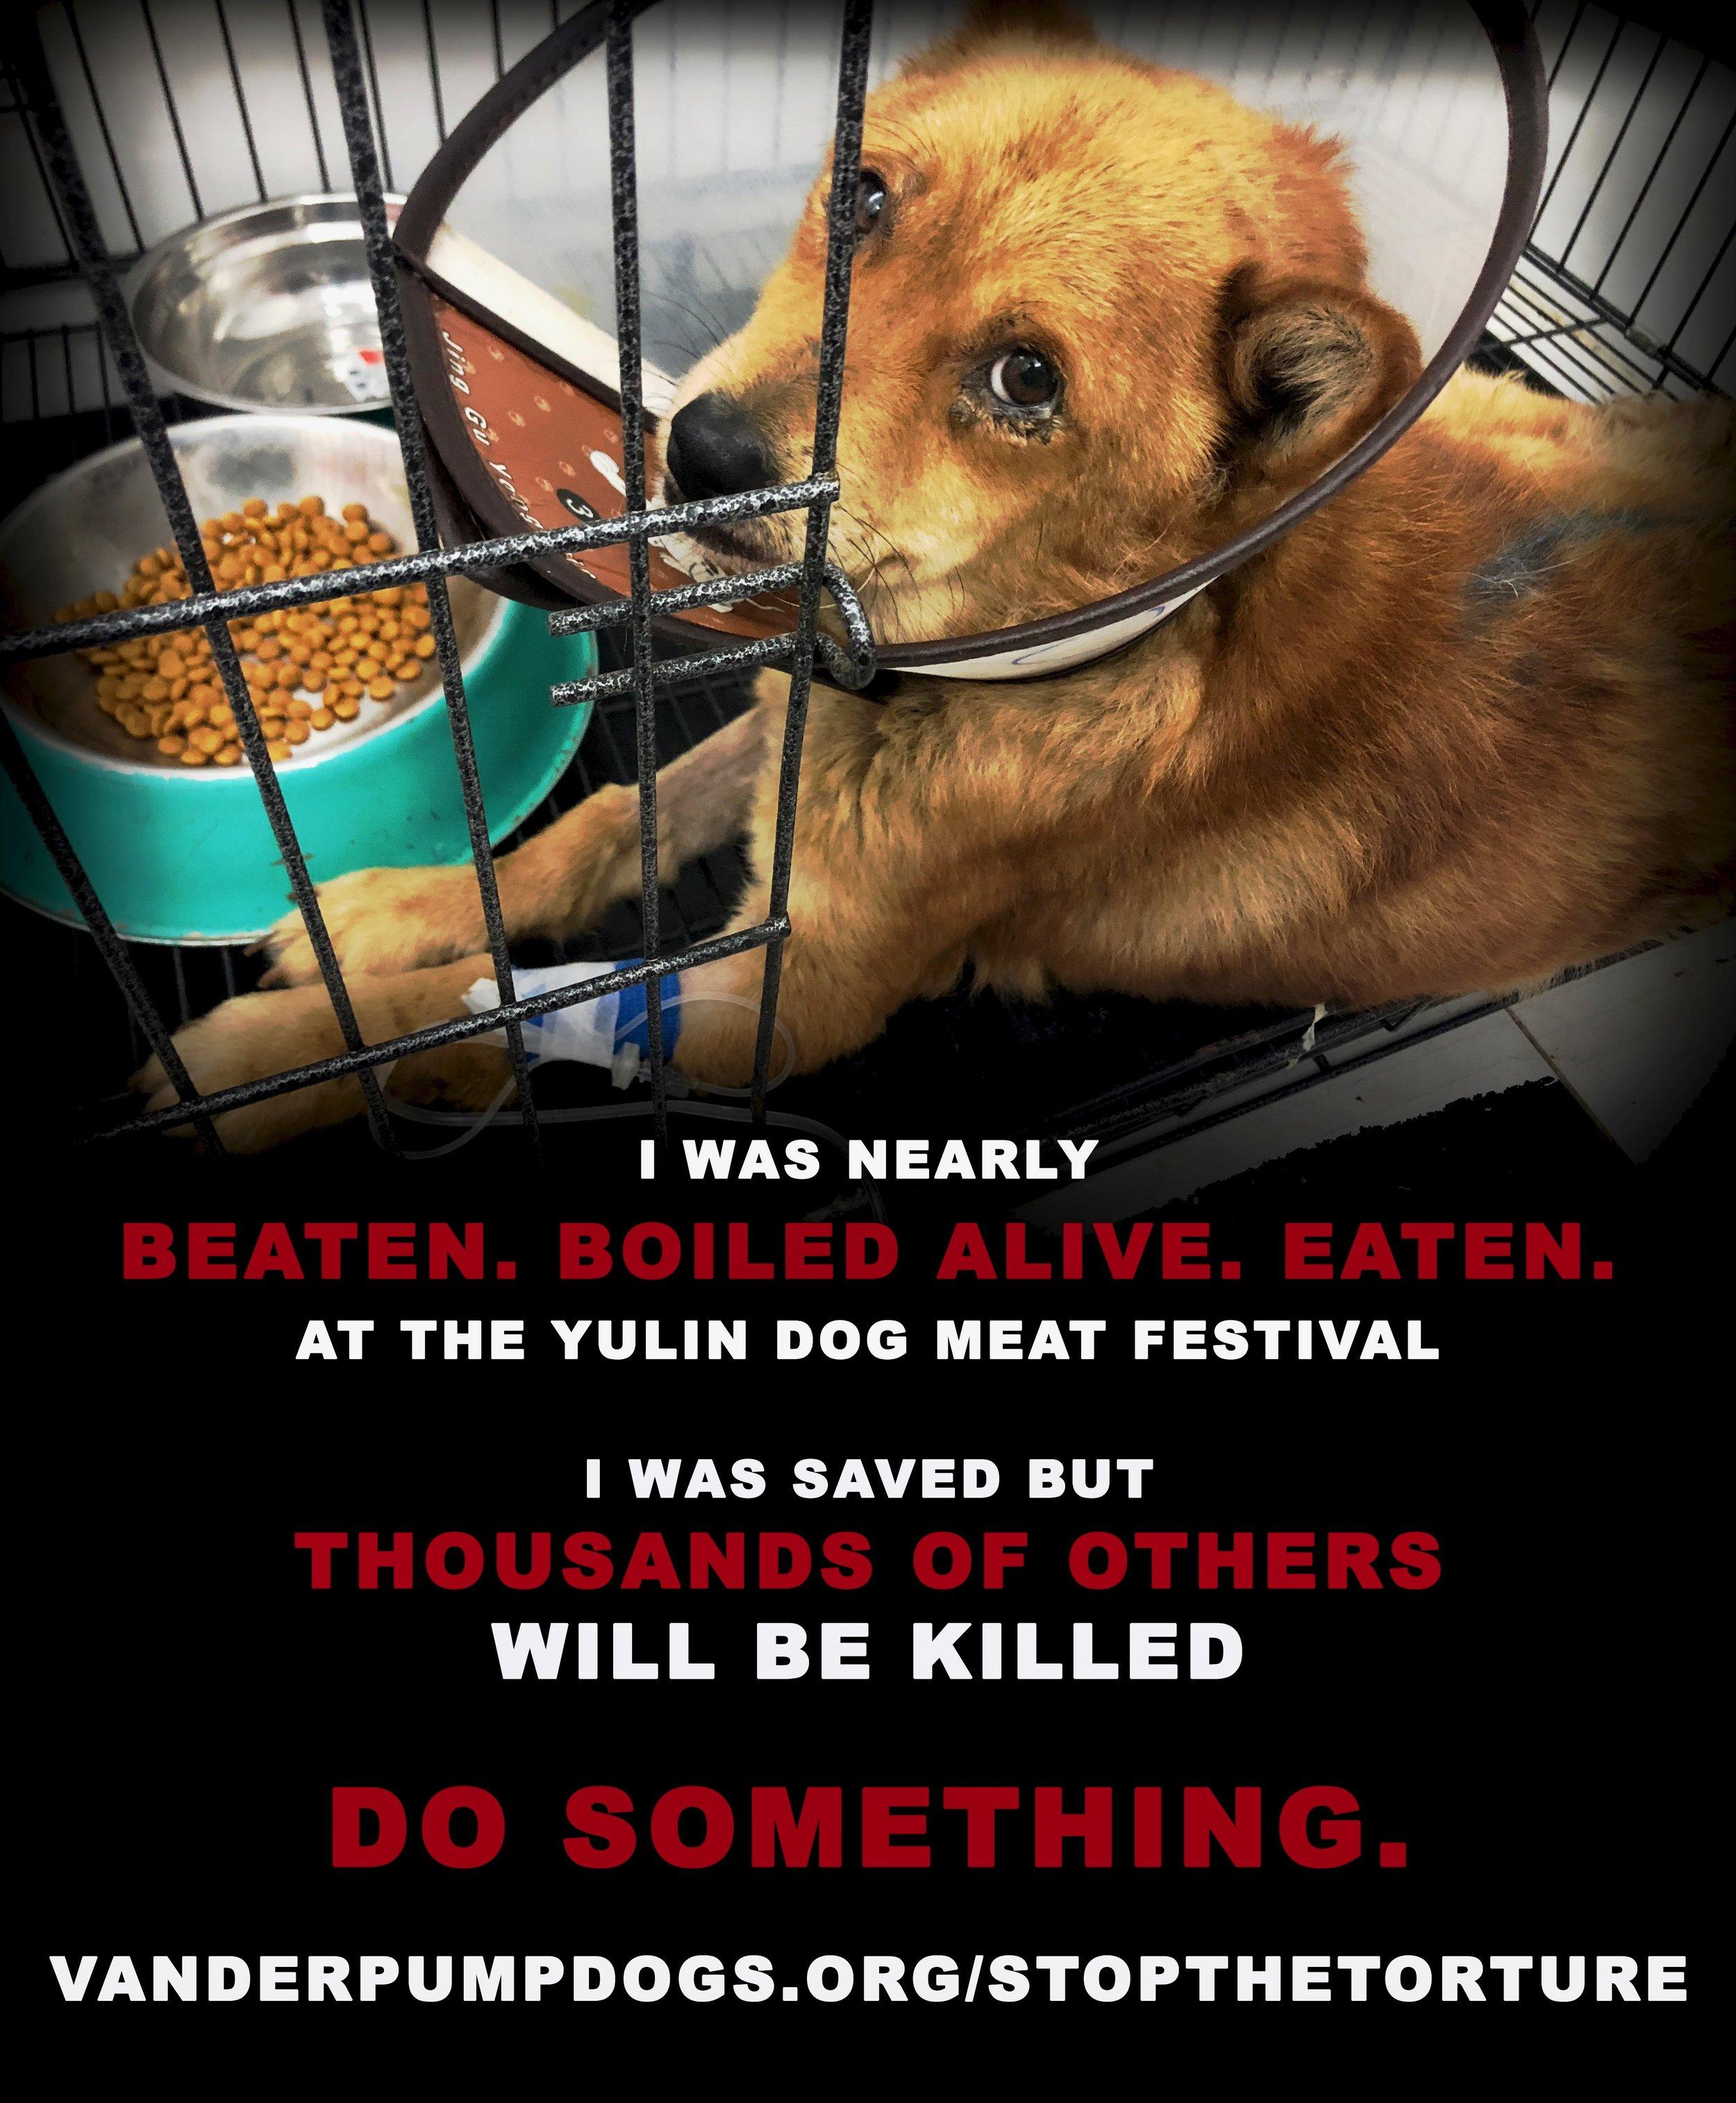 StopTheTorture Campaign — The Vanderpump Dog Foundation